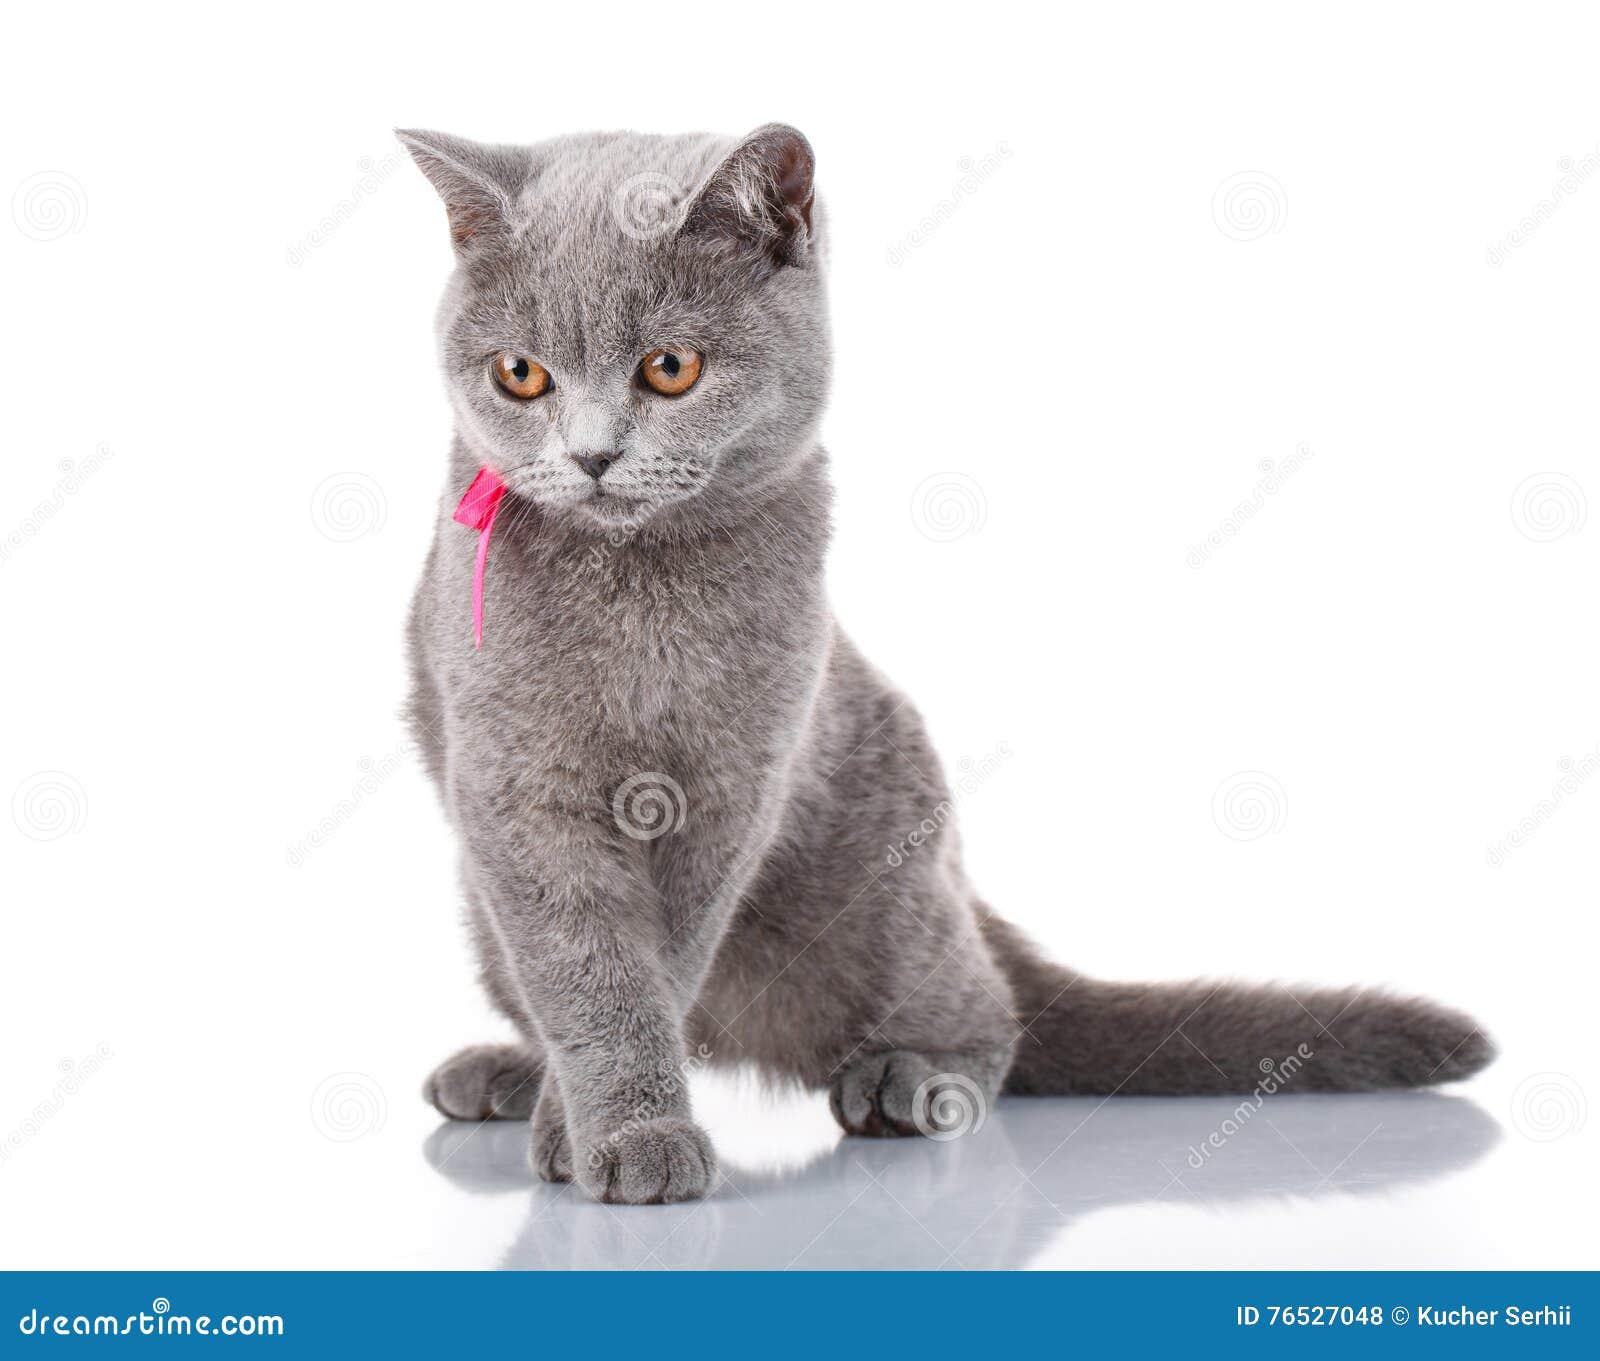 Grey Scottish Fold-kat met roze lintzitting op wit, concept gunst